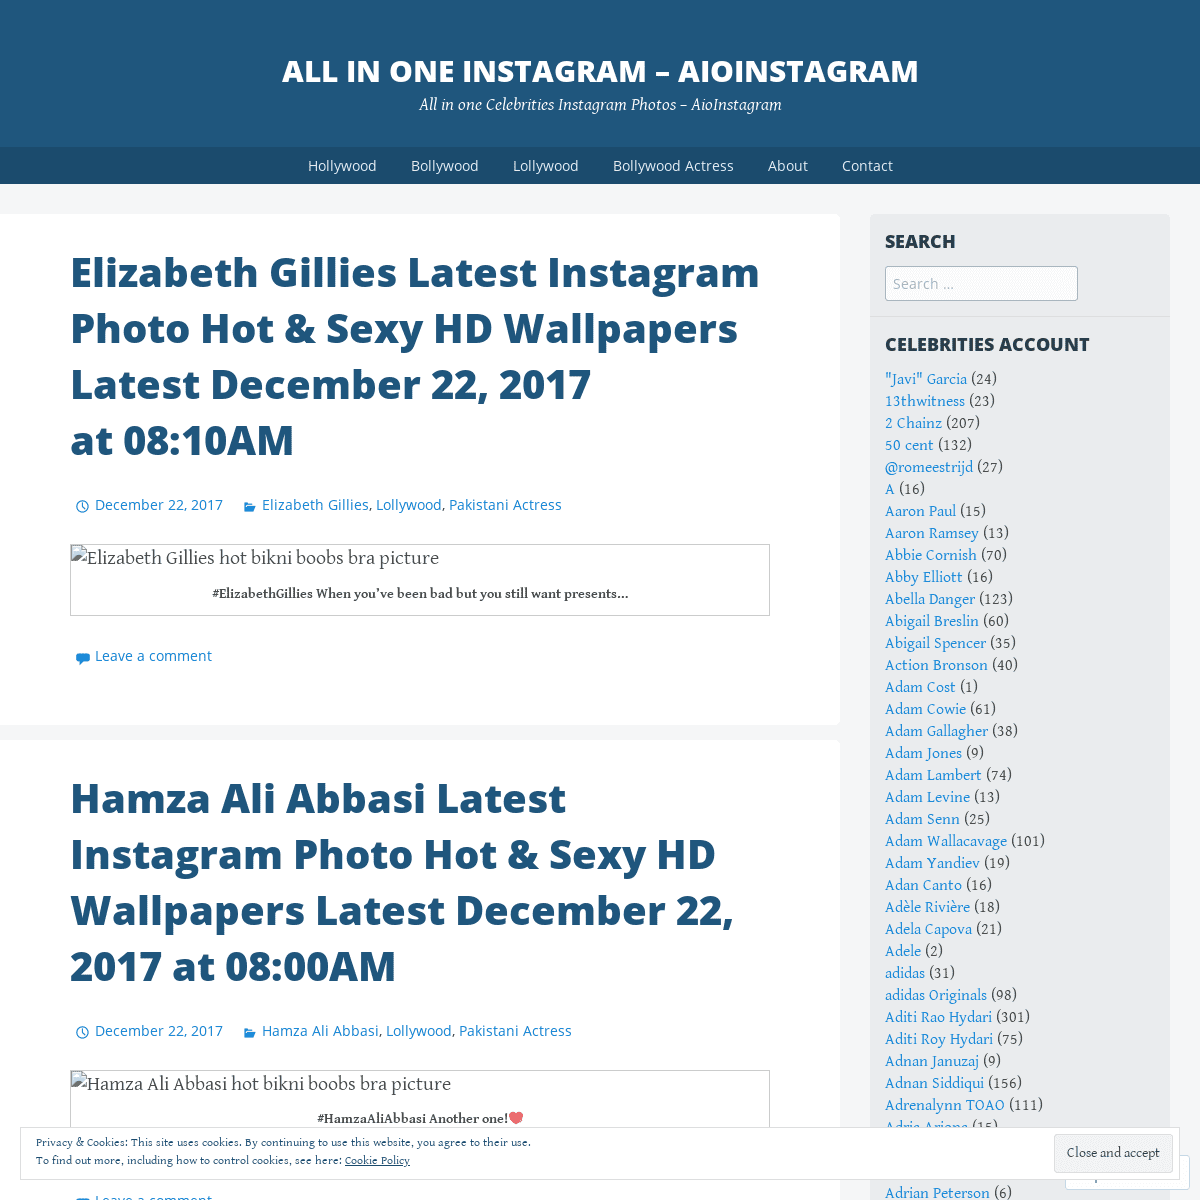 ALL IN ONE INSTAGRAM - AioInstagram - All in one Celebrities Instagram Photos – AioInstagram